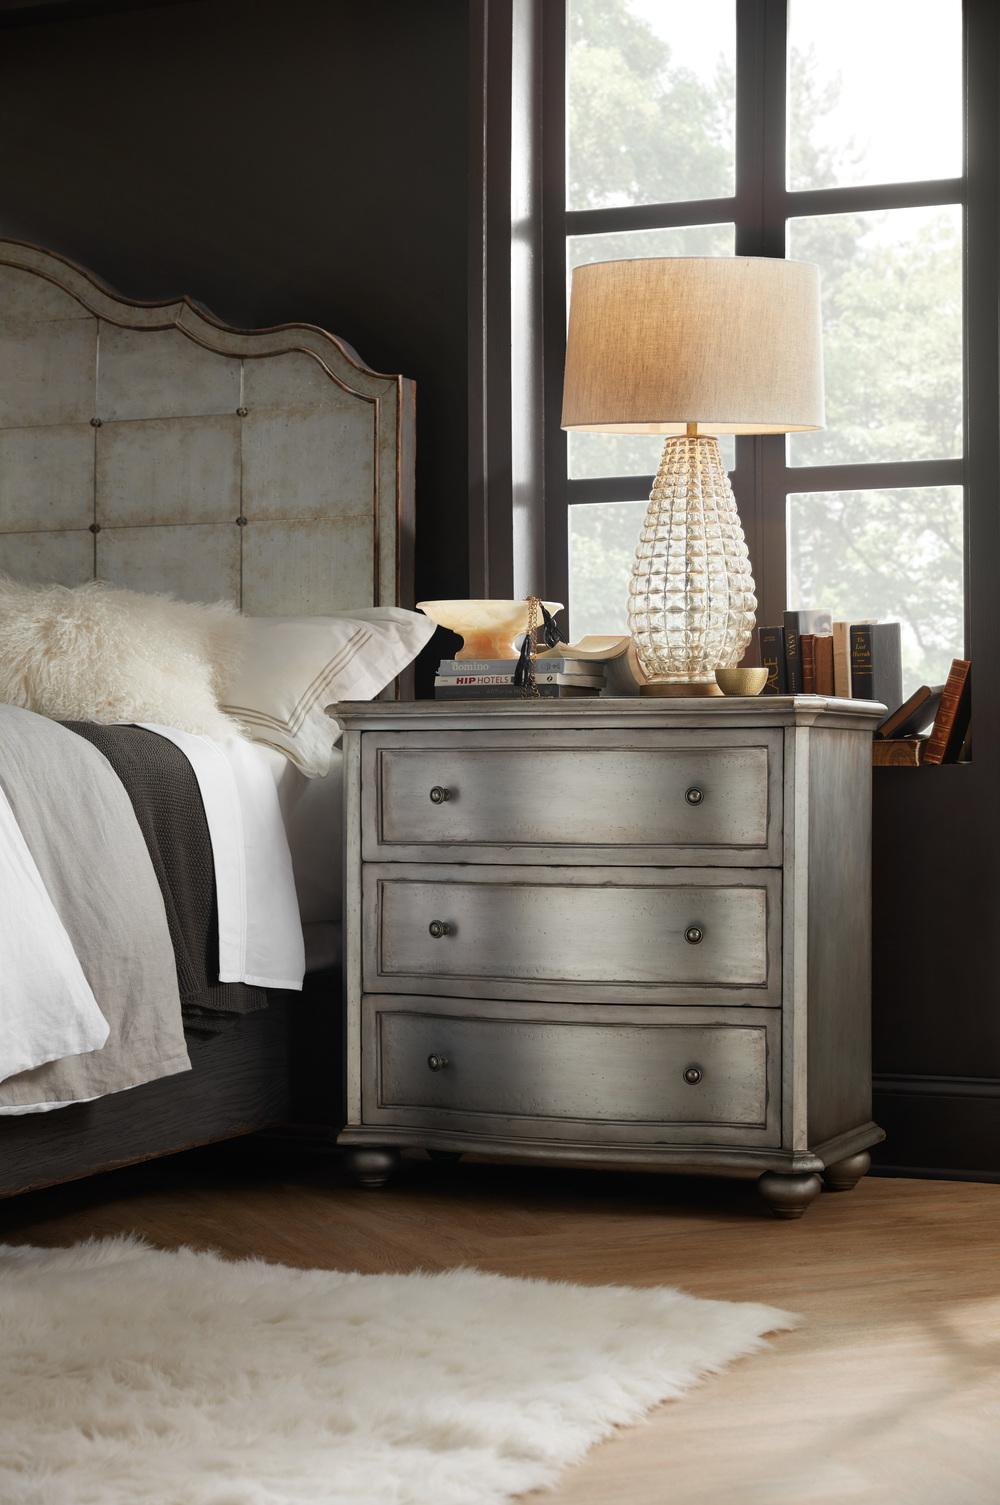 Hooker Furniture - Arabella Bachelor Chest